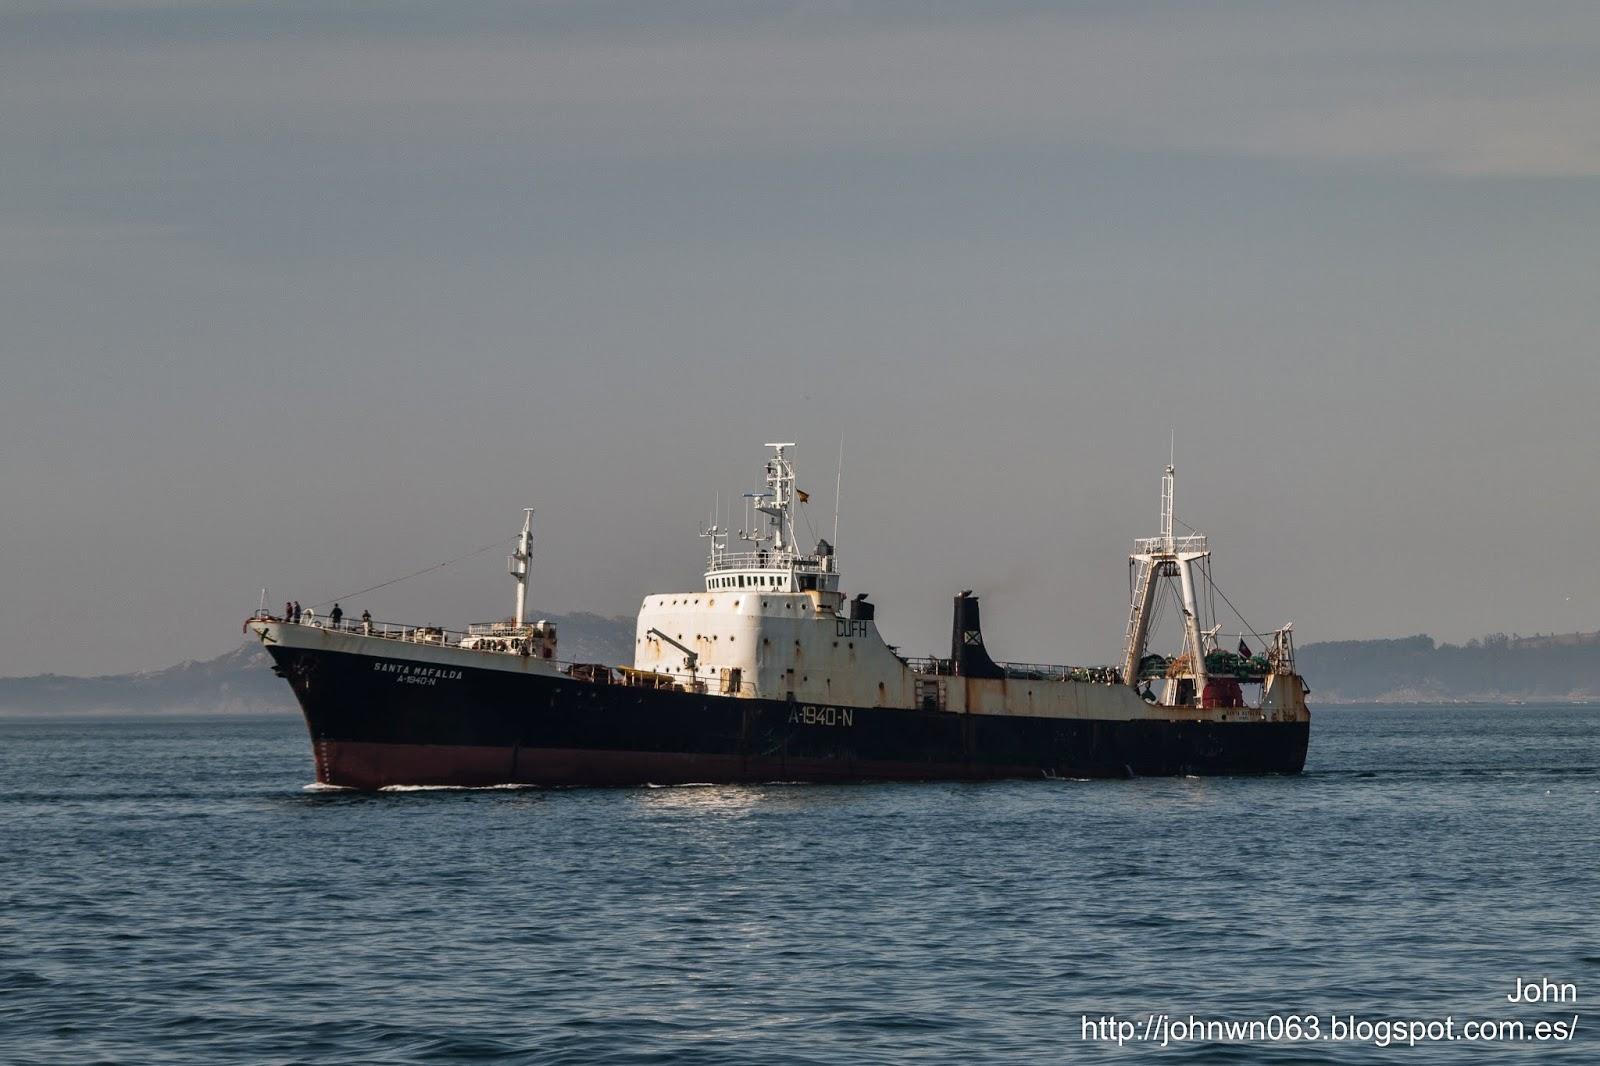 fotos de barcos, trawler, aveiro, vigo, arrastrero, santa mafalda